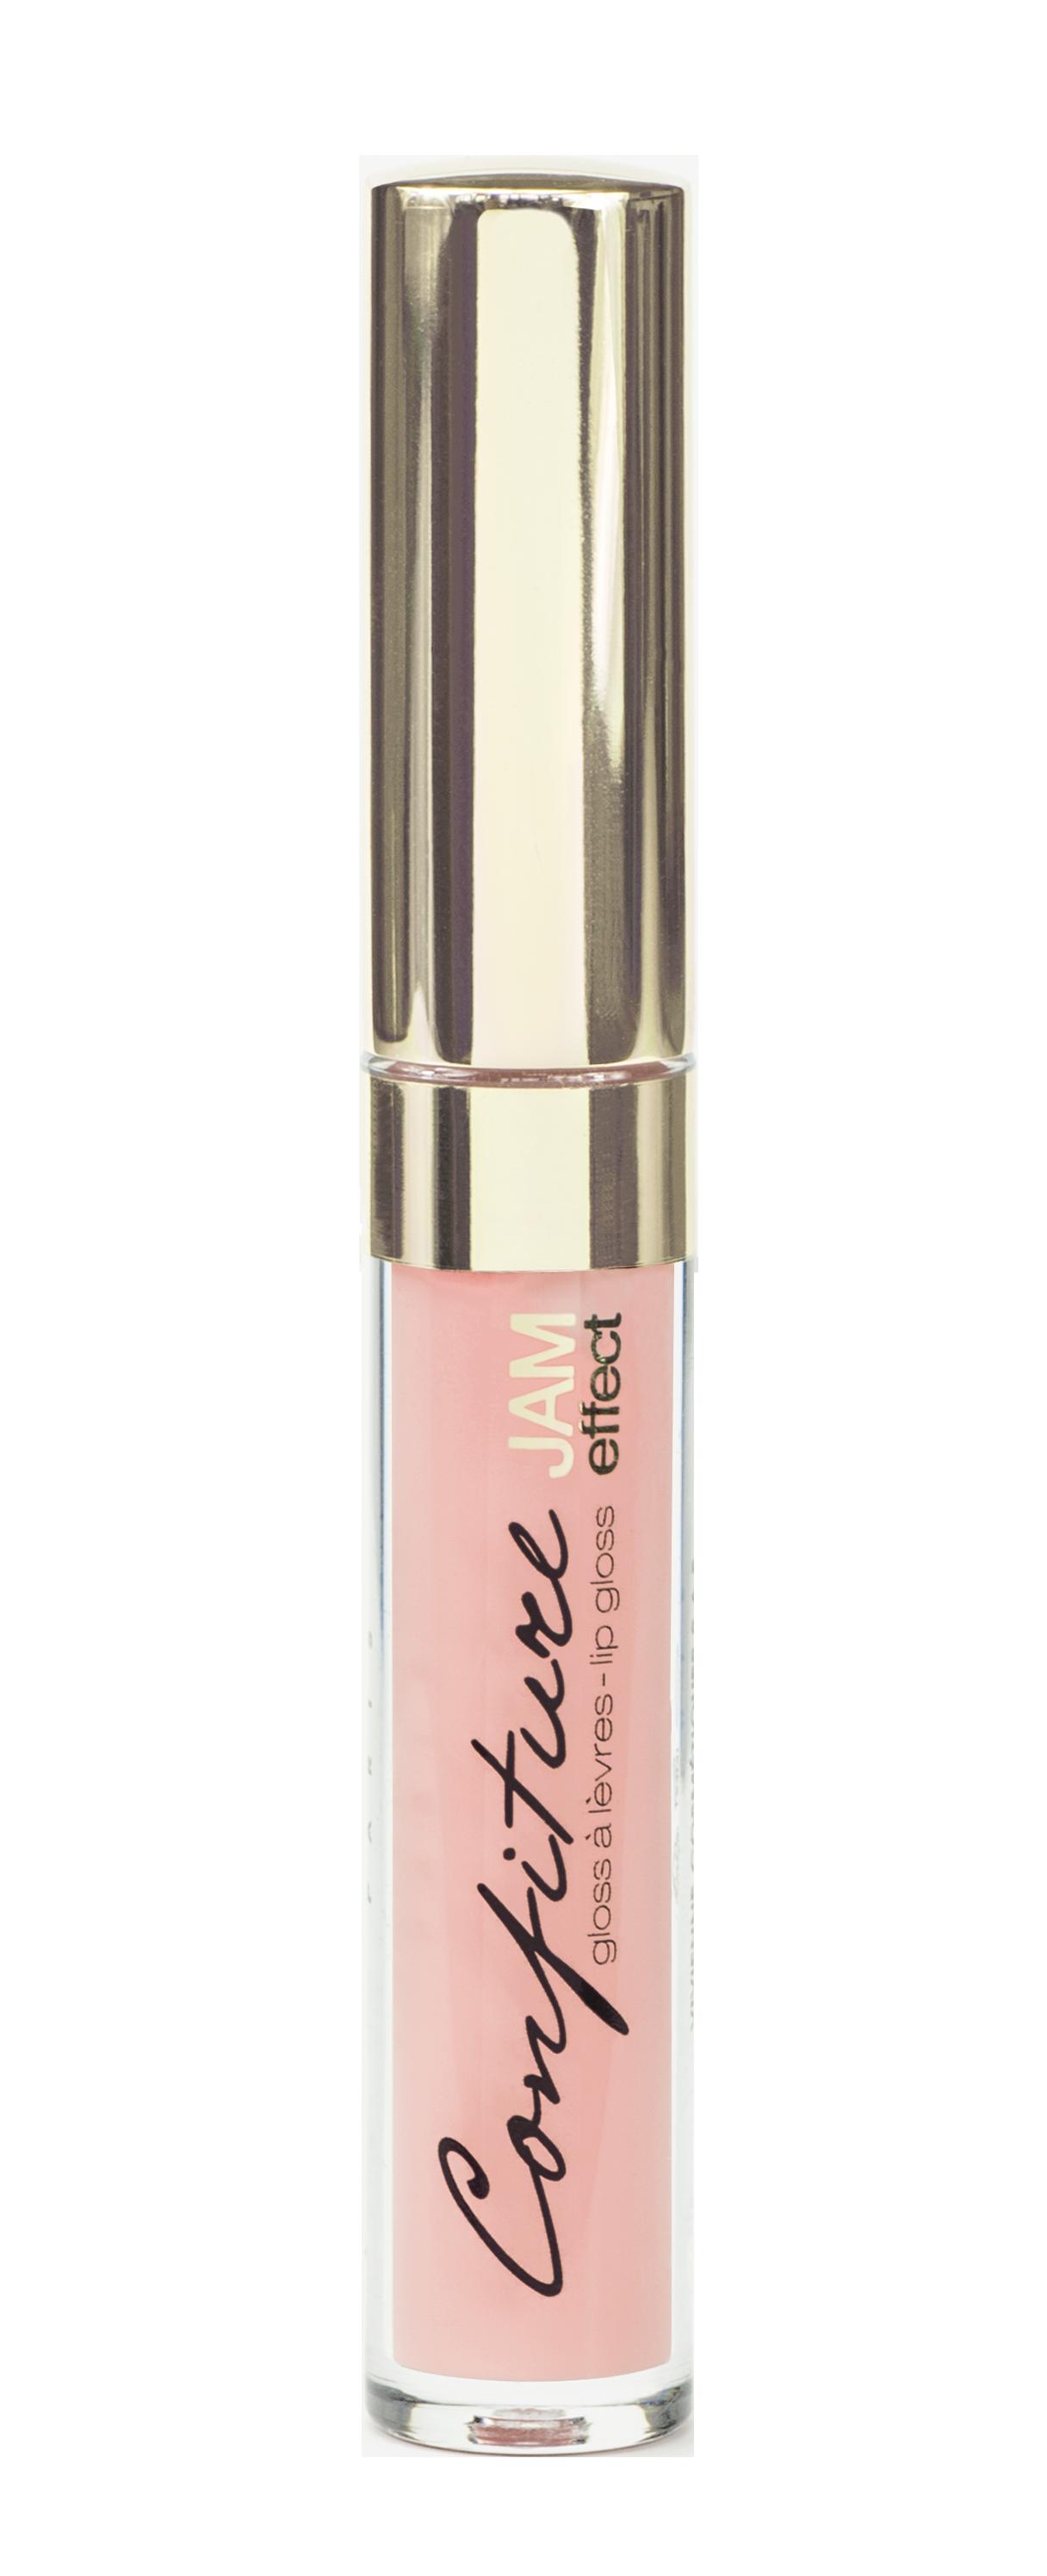 Vivienne Sabo - Lip Gloss Confiture